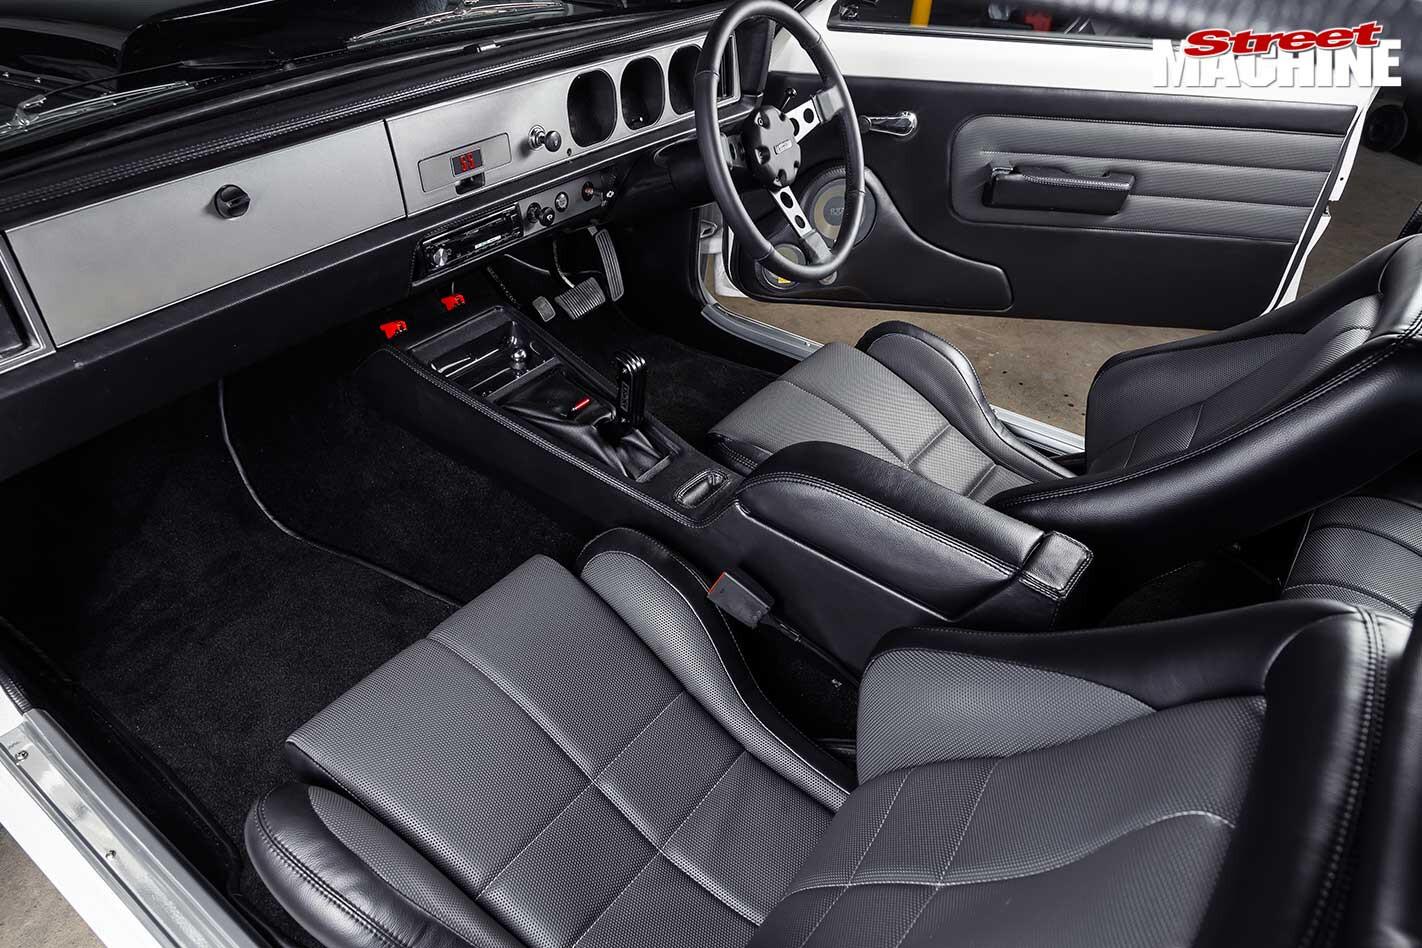 Holden Torana LX SS hatch interior